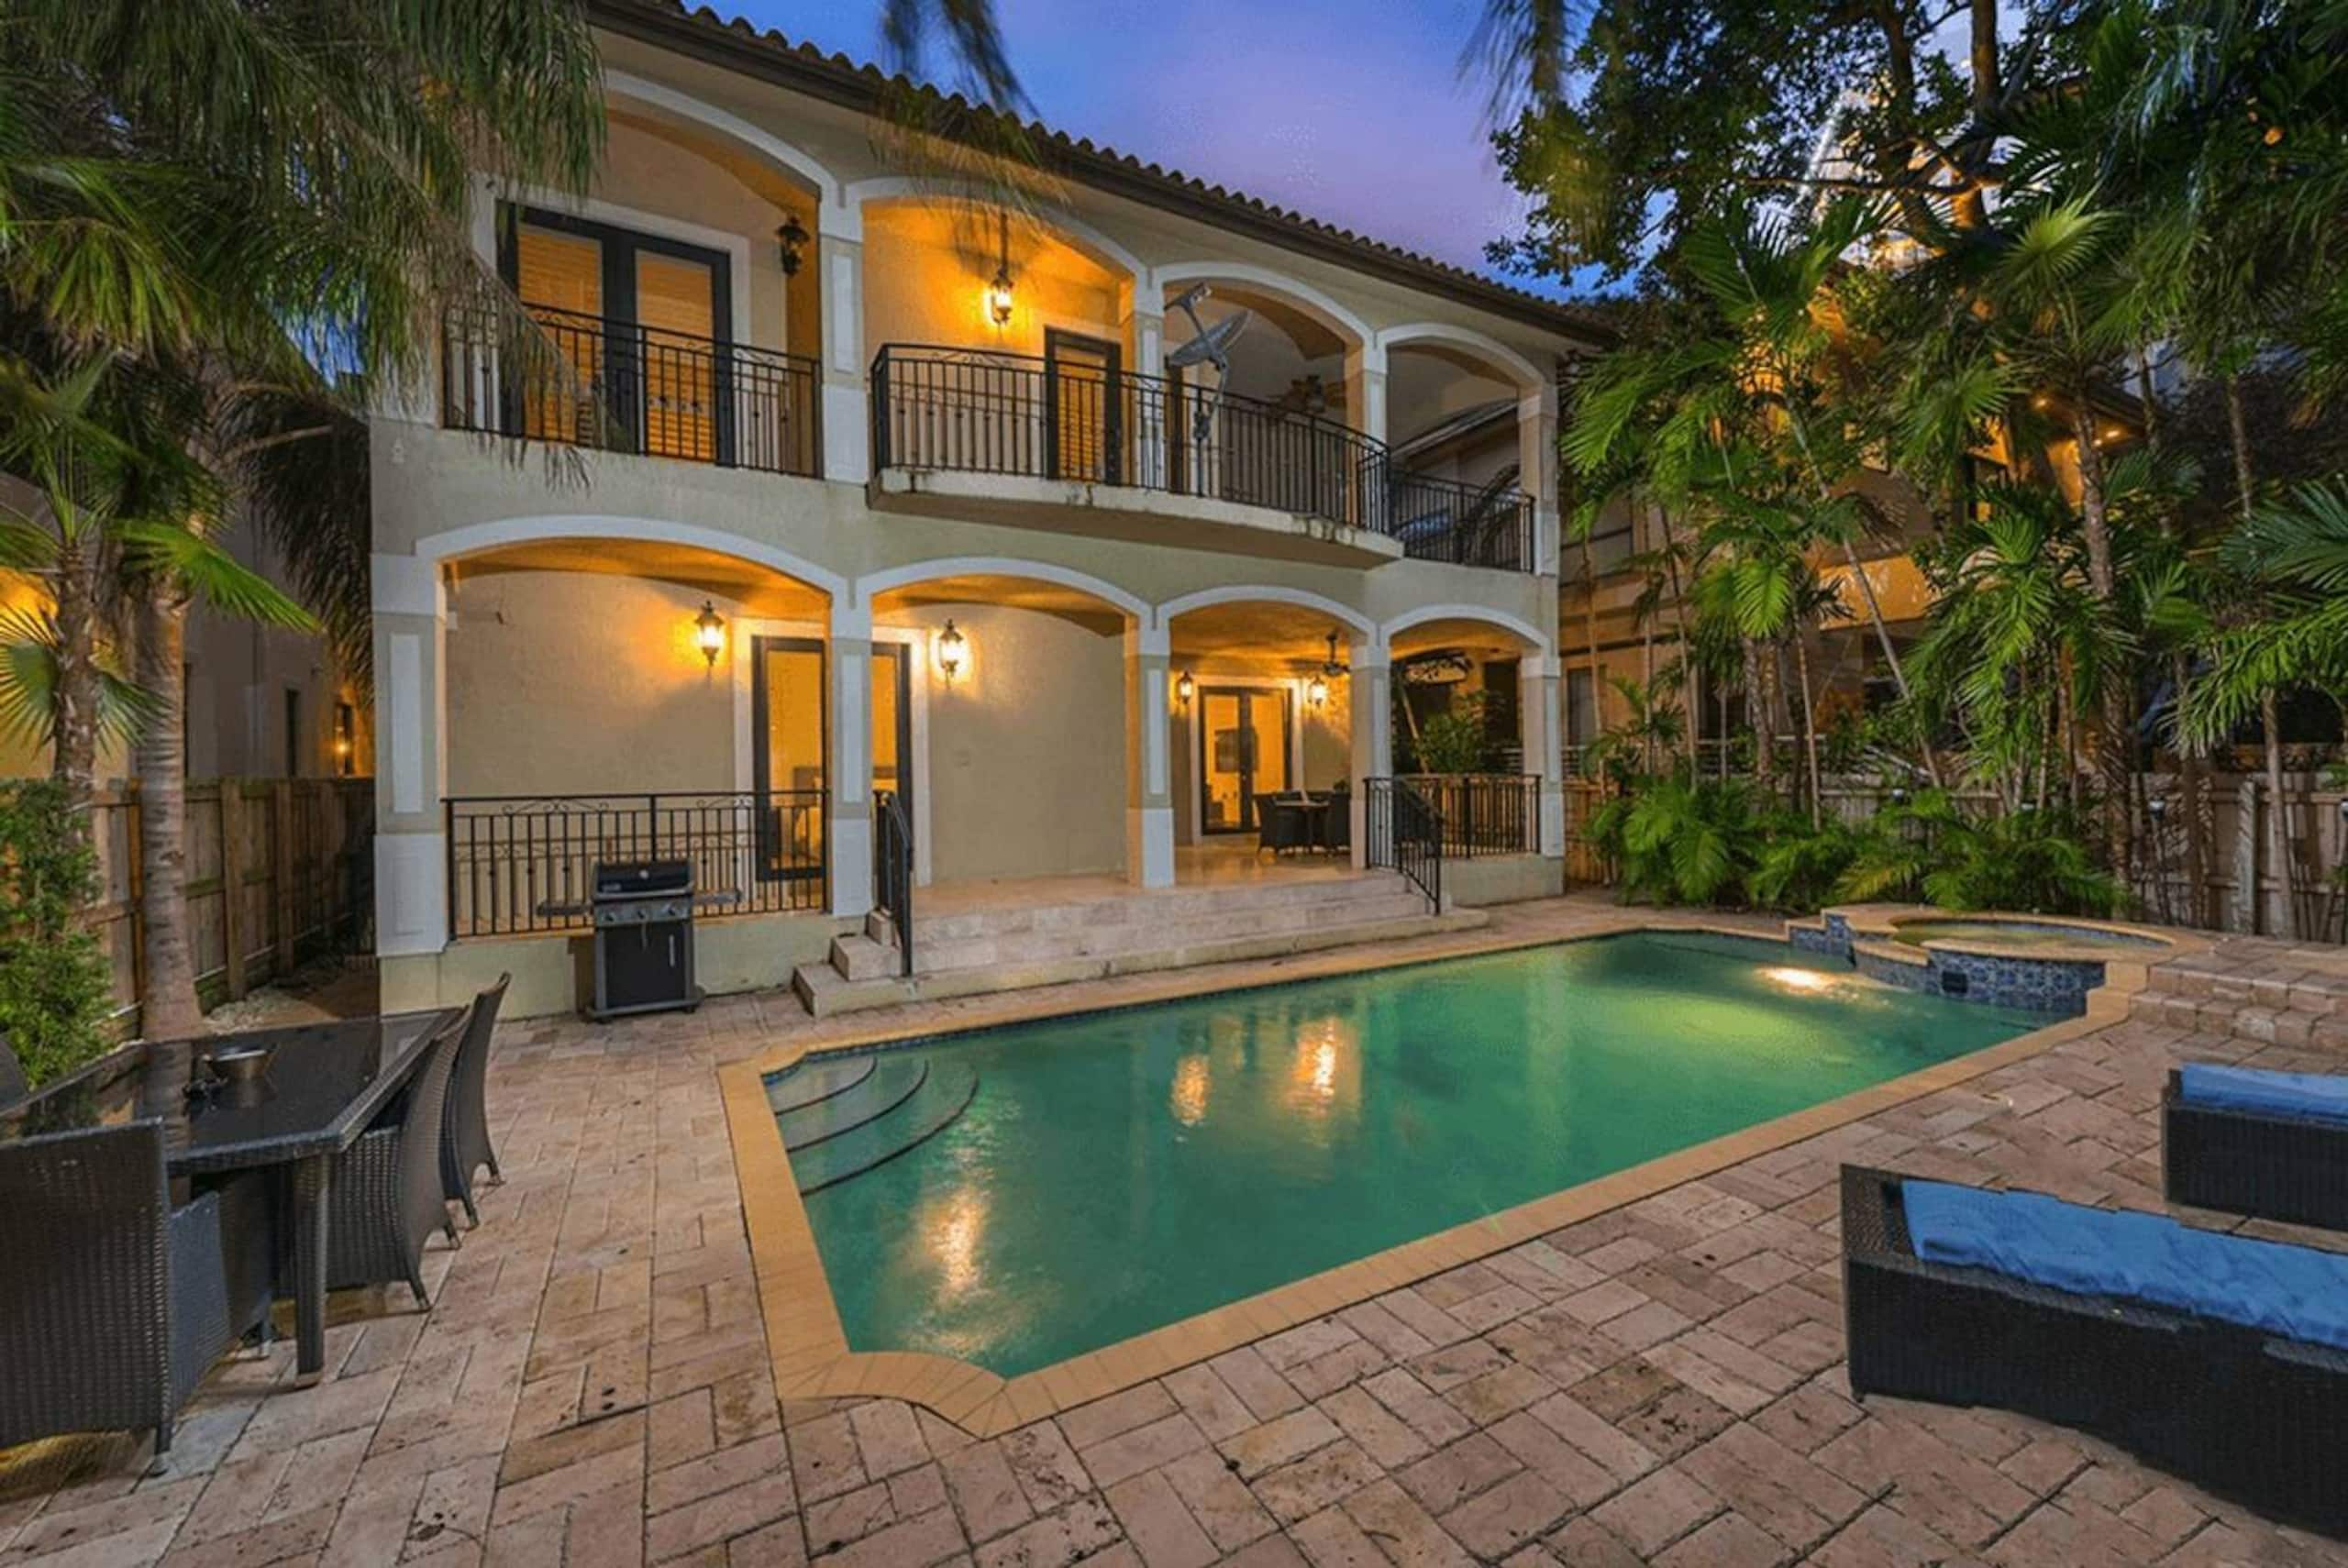 Apartment Villa Lawrence - Luxury Villa photo 22682508